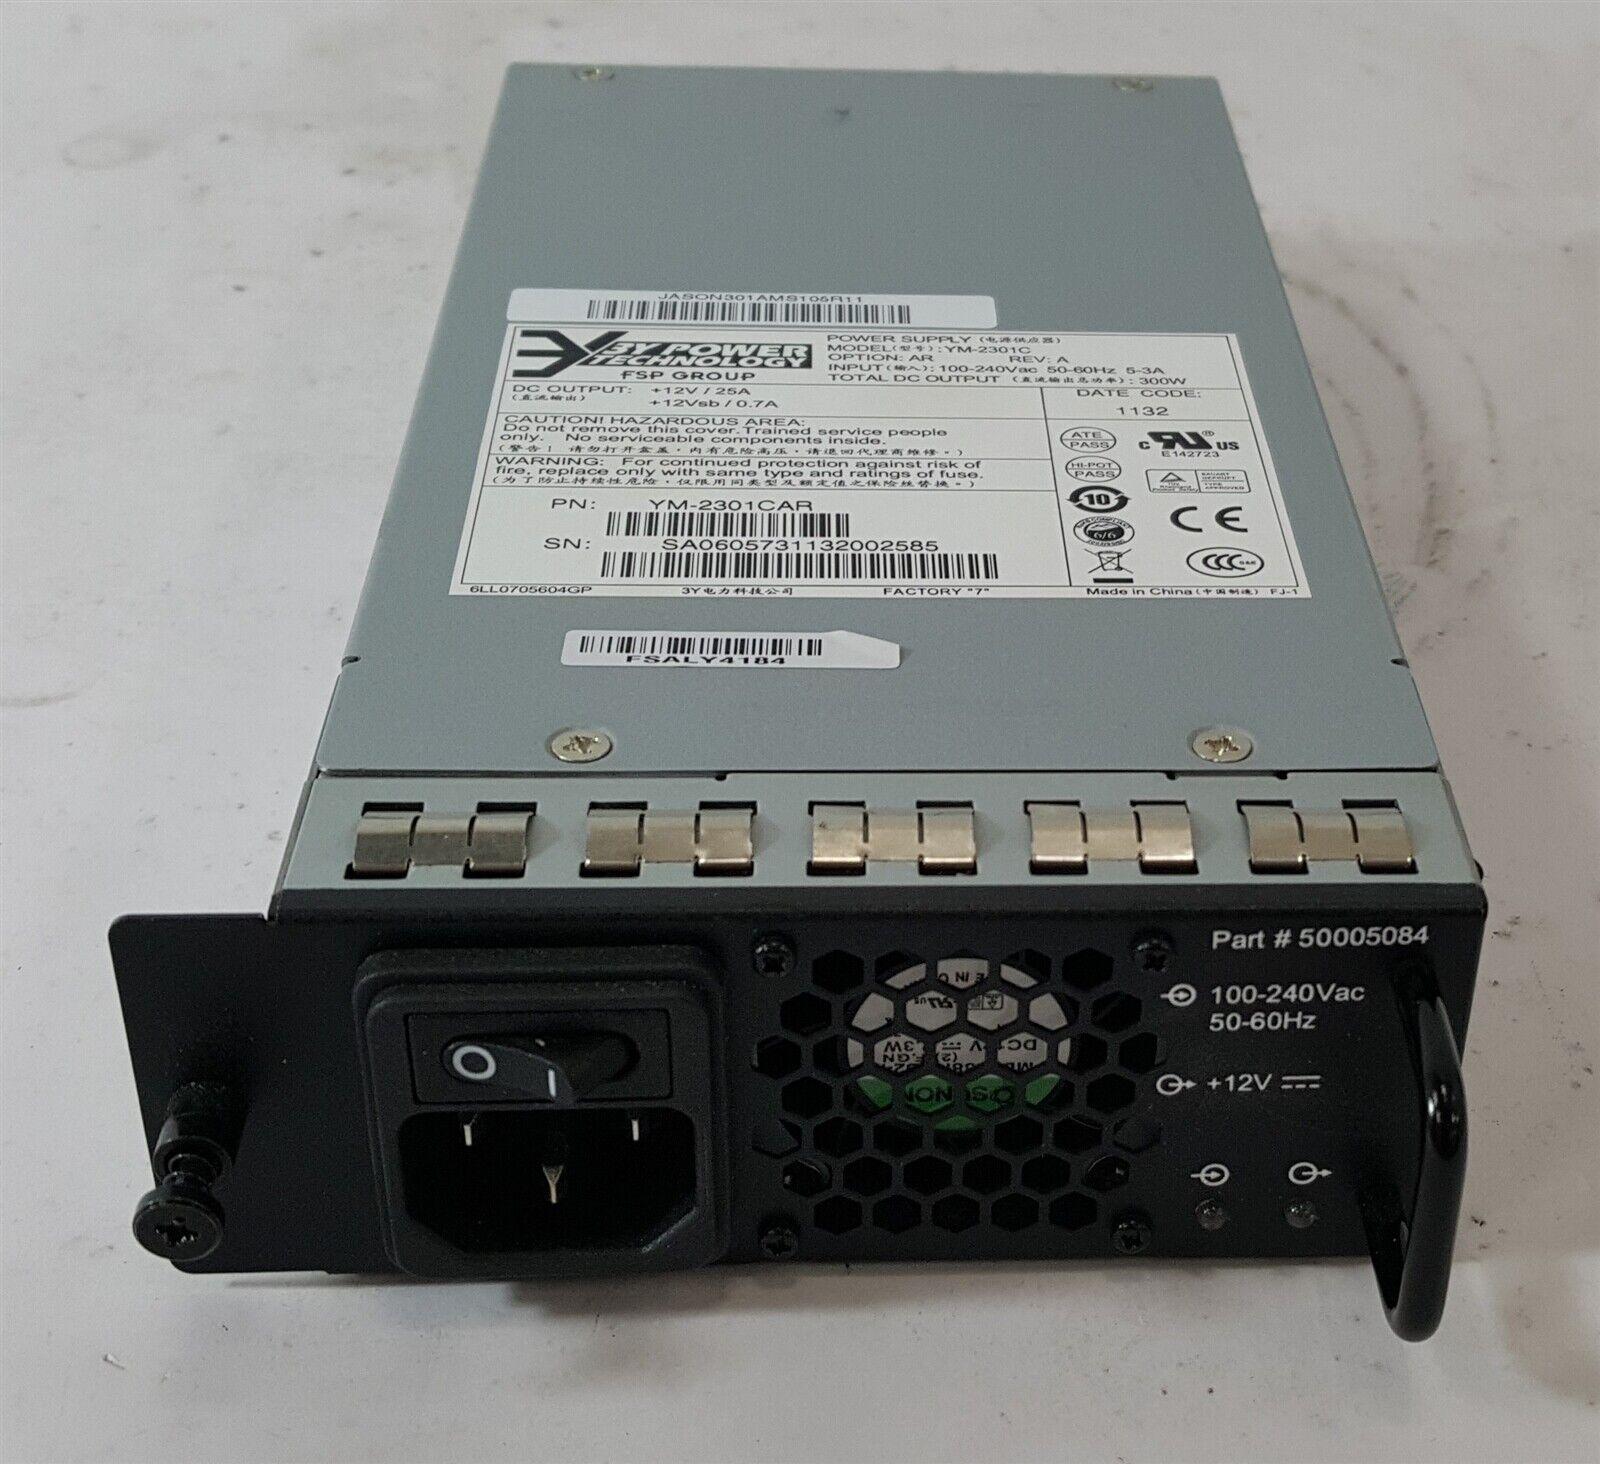 MITEL MXE 3300 ICP CONTROLLER 50006211 POWER SUPPLY MODULE 50005084